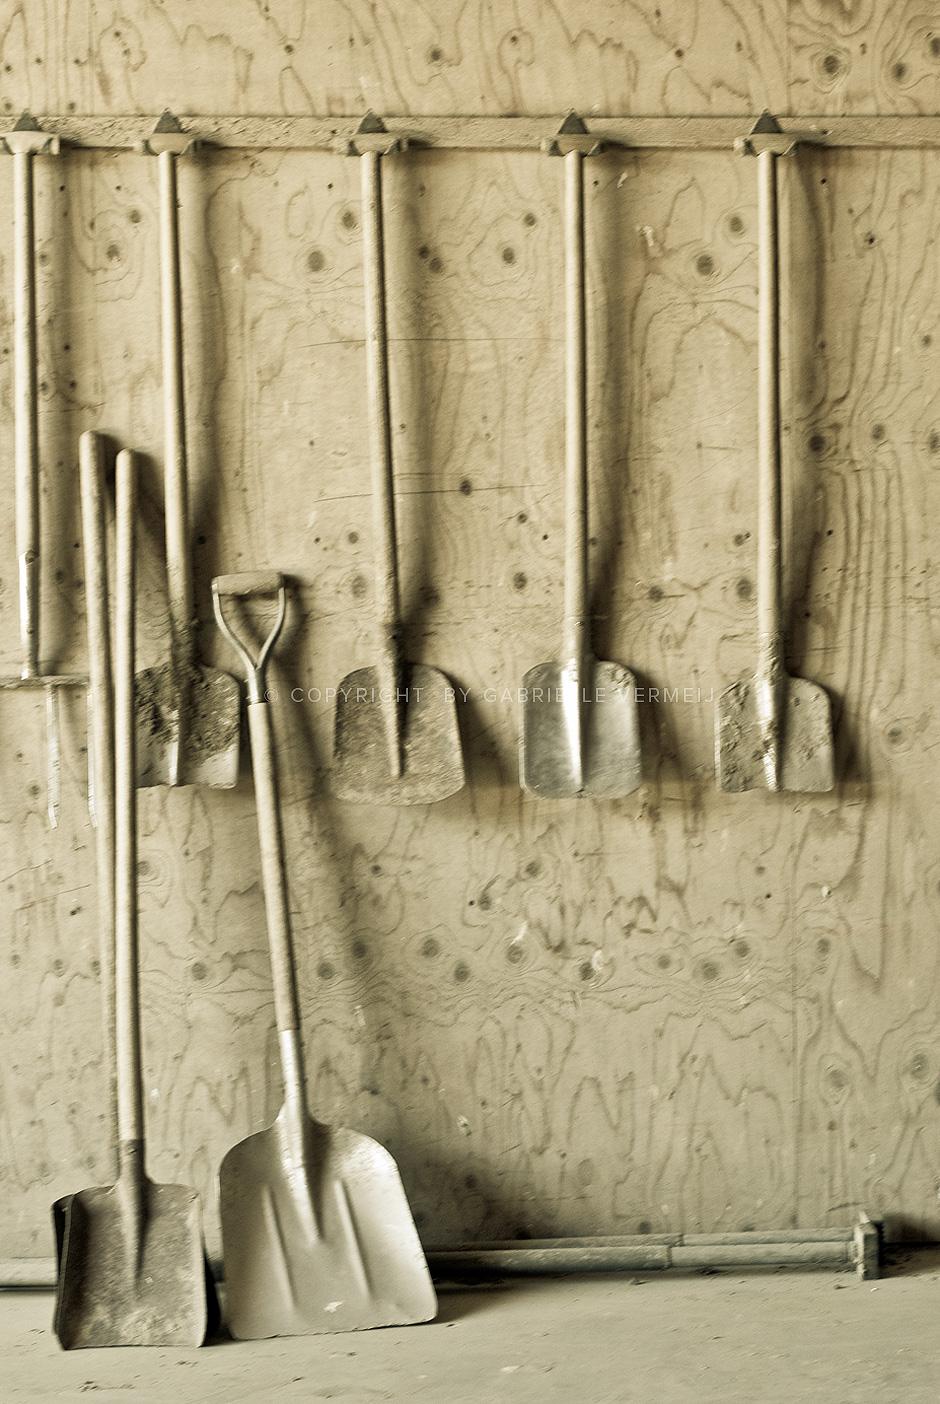 Various shovels in a barn by Gabrielle Vermeij